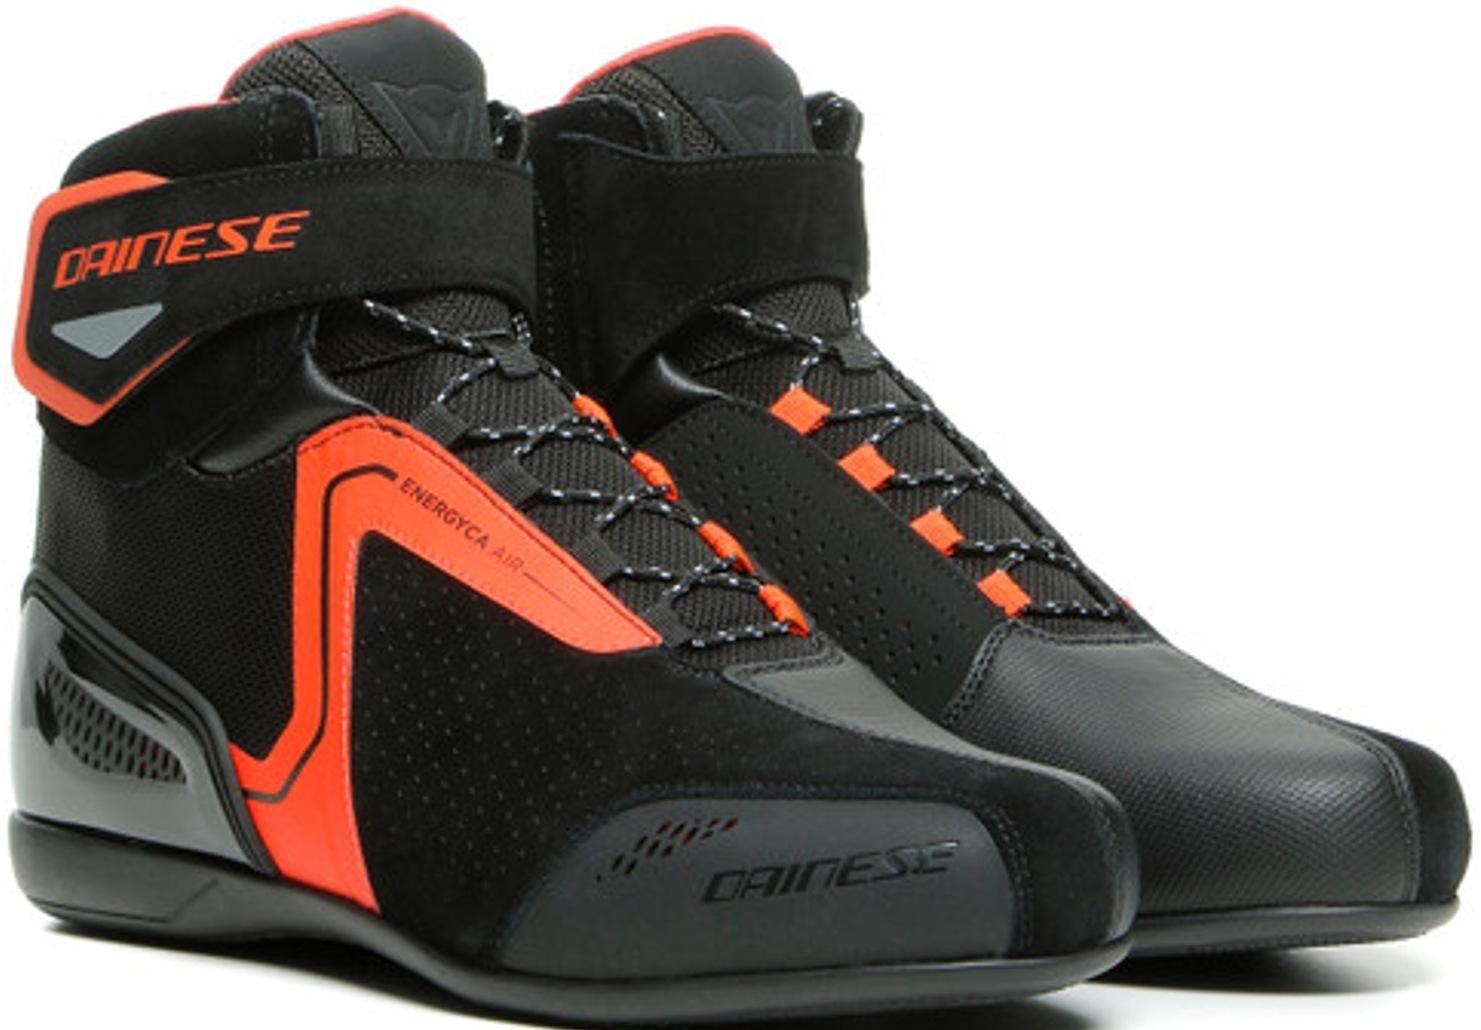 Dainese Energyca Air Motorradschuhe, schwarz-rot, Größe 40, schwarz-rot, Größe 40